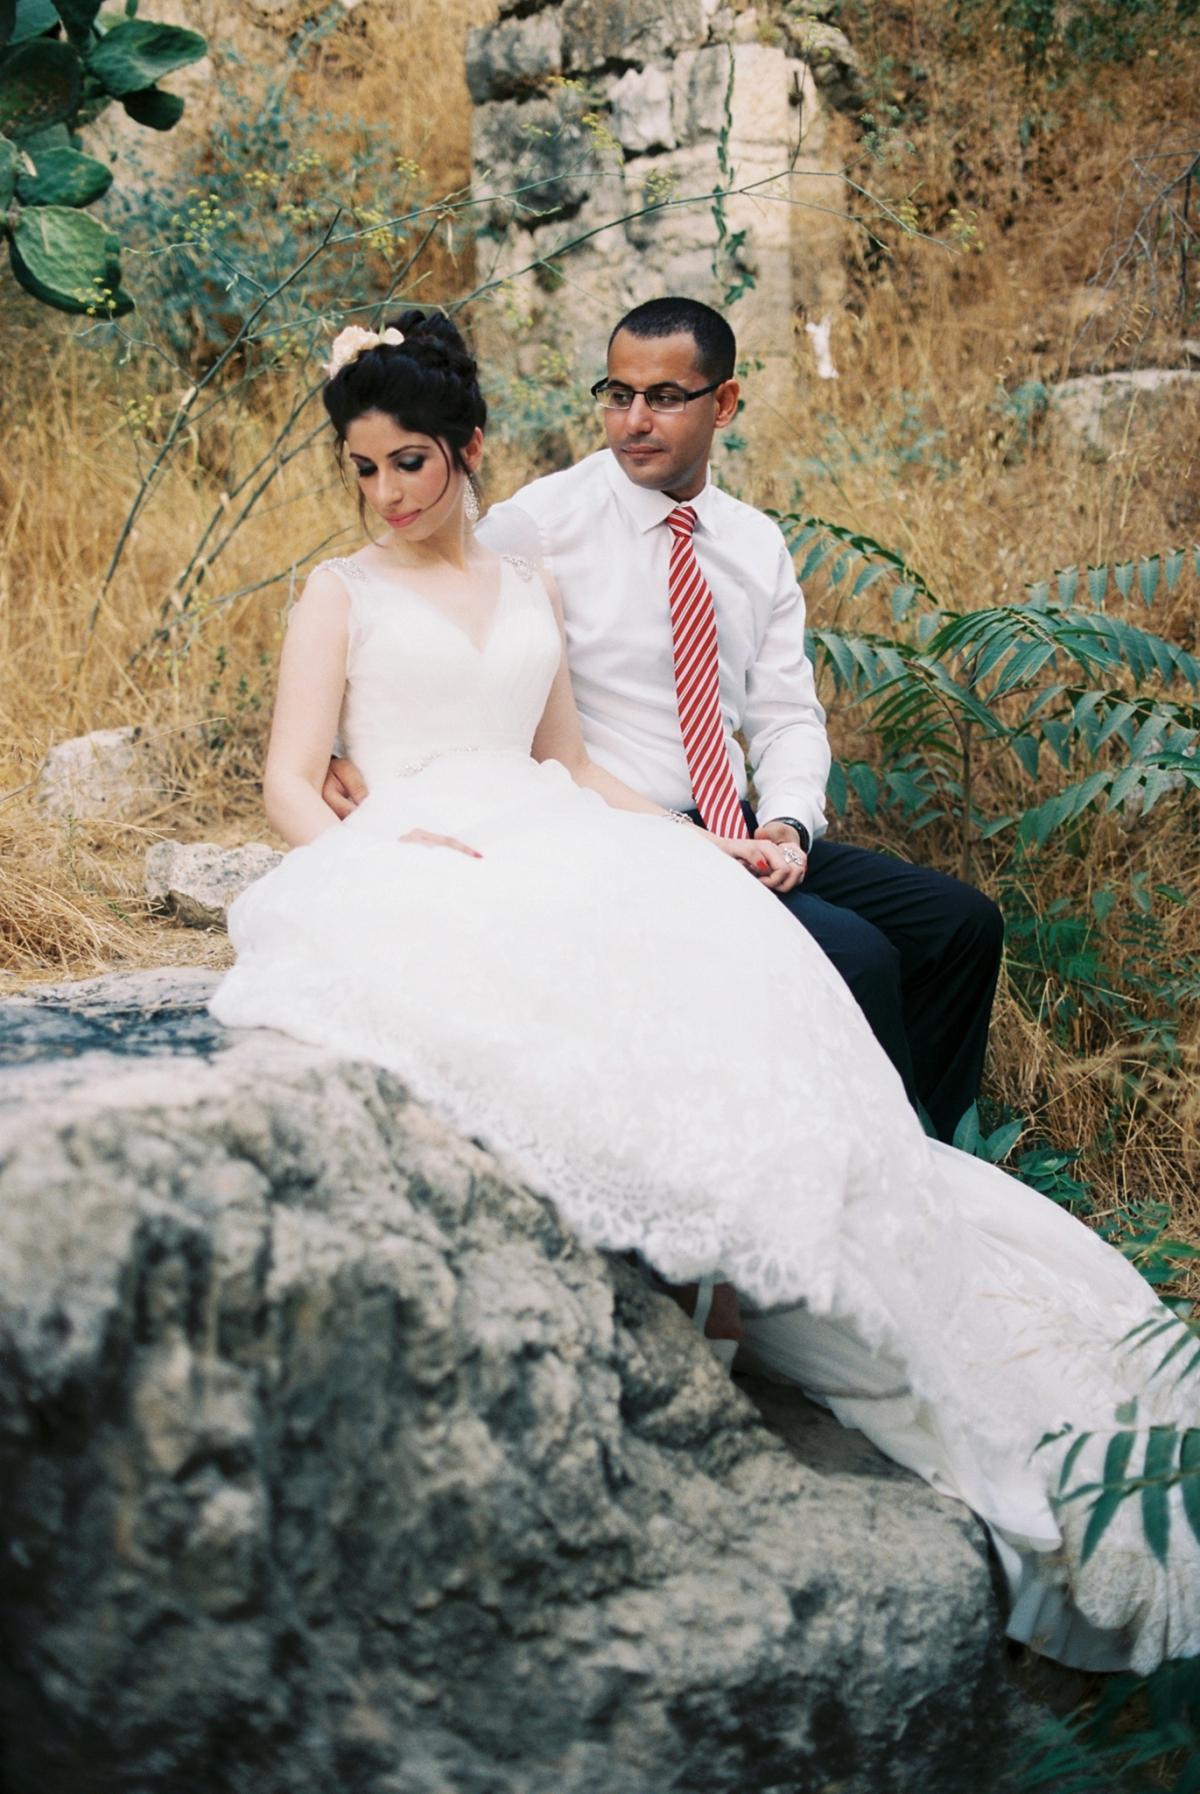 Lifta Bridal Portraits - Jerusalem Israel - Muna and Ali - Sigala Photography_0014